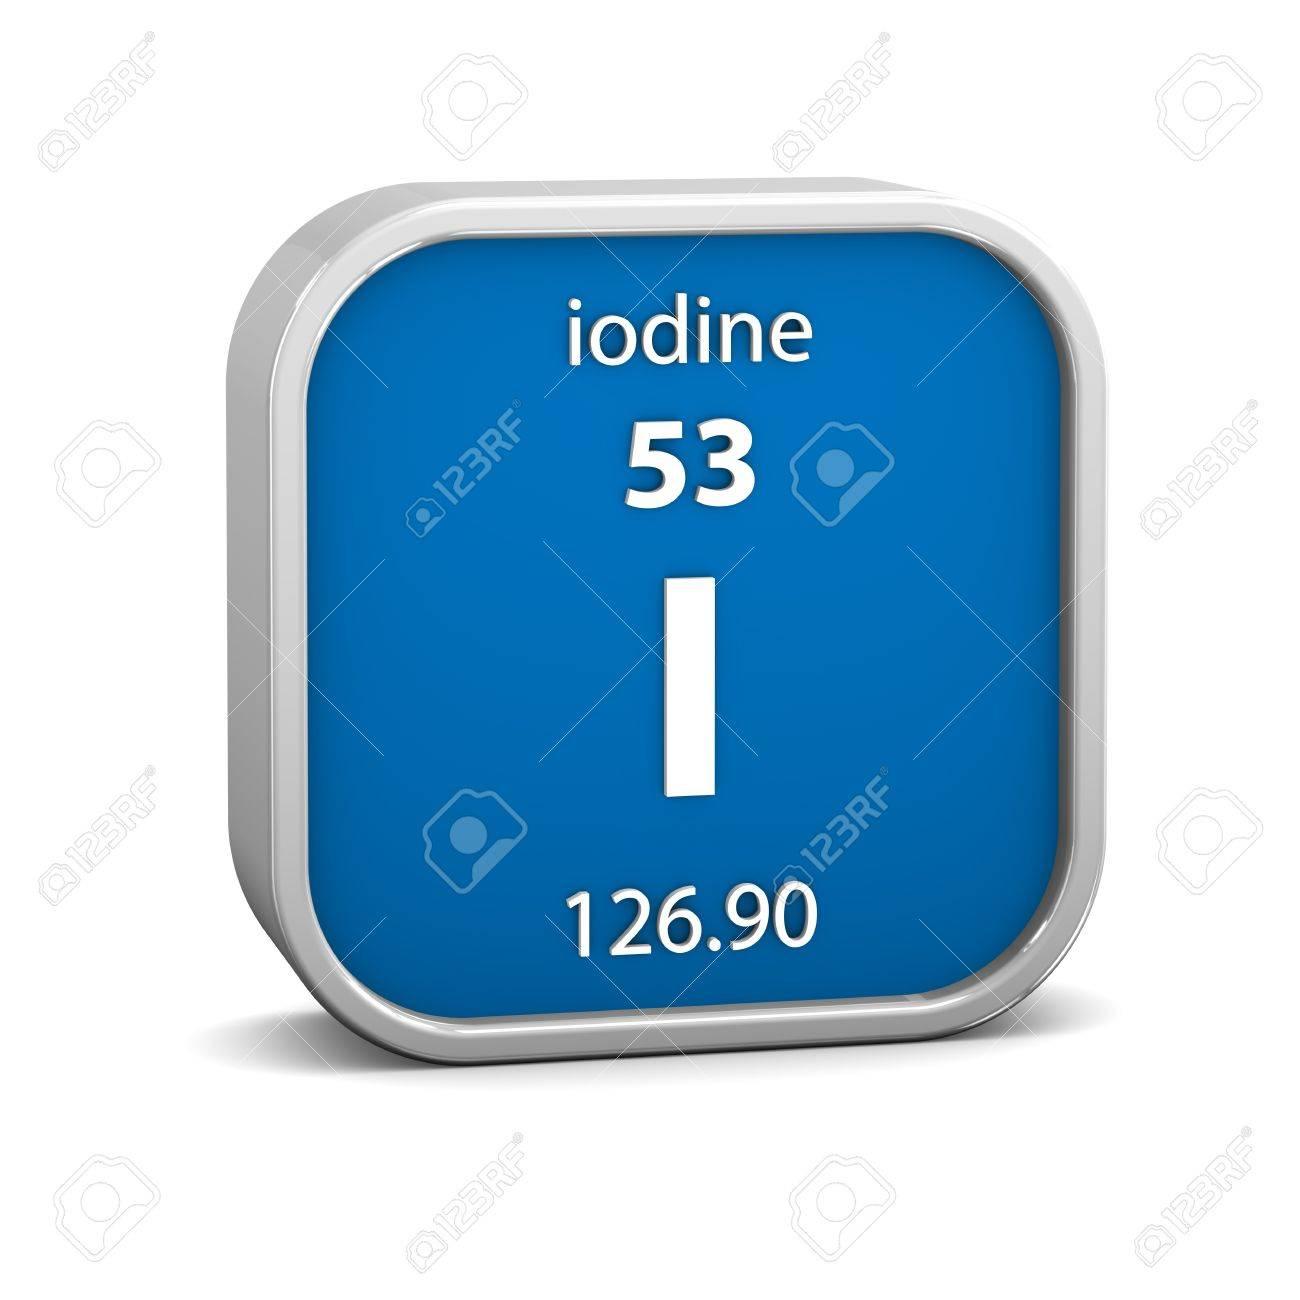 Periodic table symbol for iodine image collections periodic periodic table symbol for iodine choice image periodic table images periodic table symbol for iodine image gamestrikefo Gallery